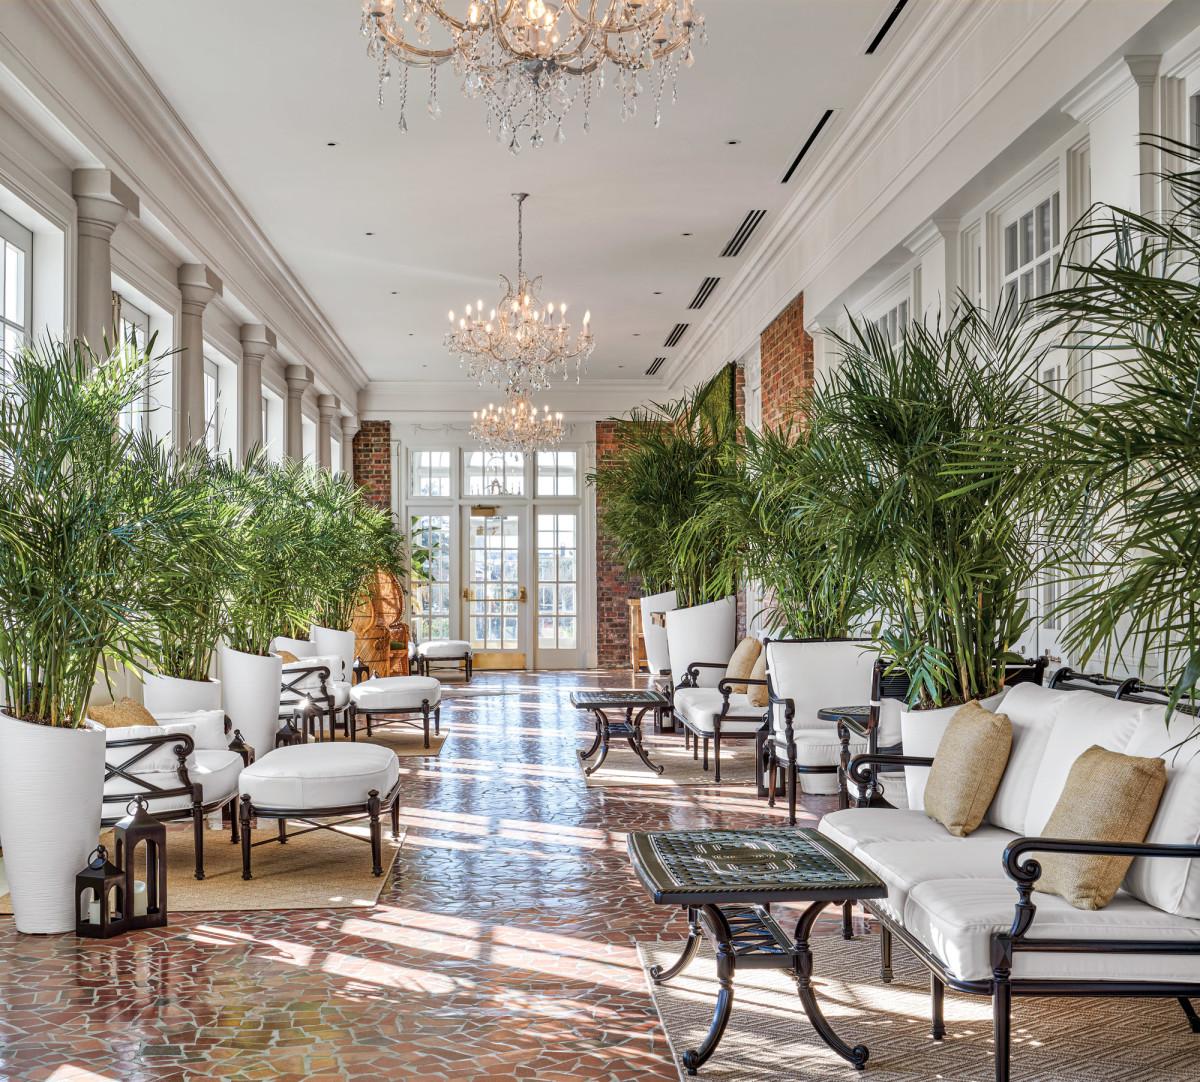 historic interior, Cavalier hotel